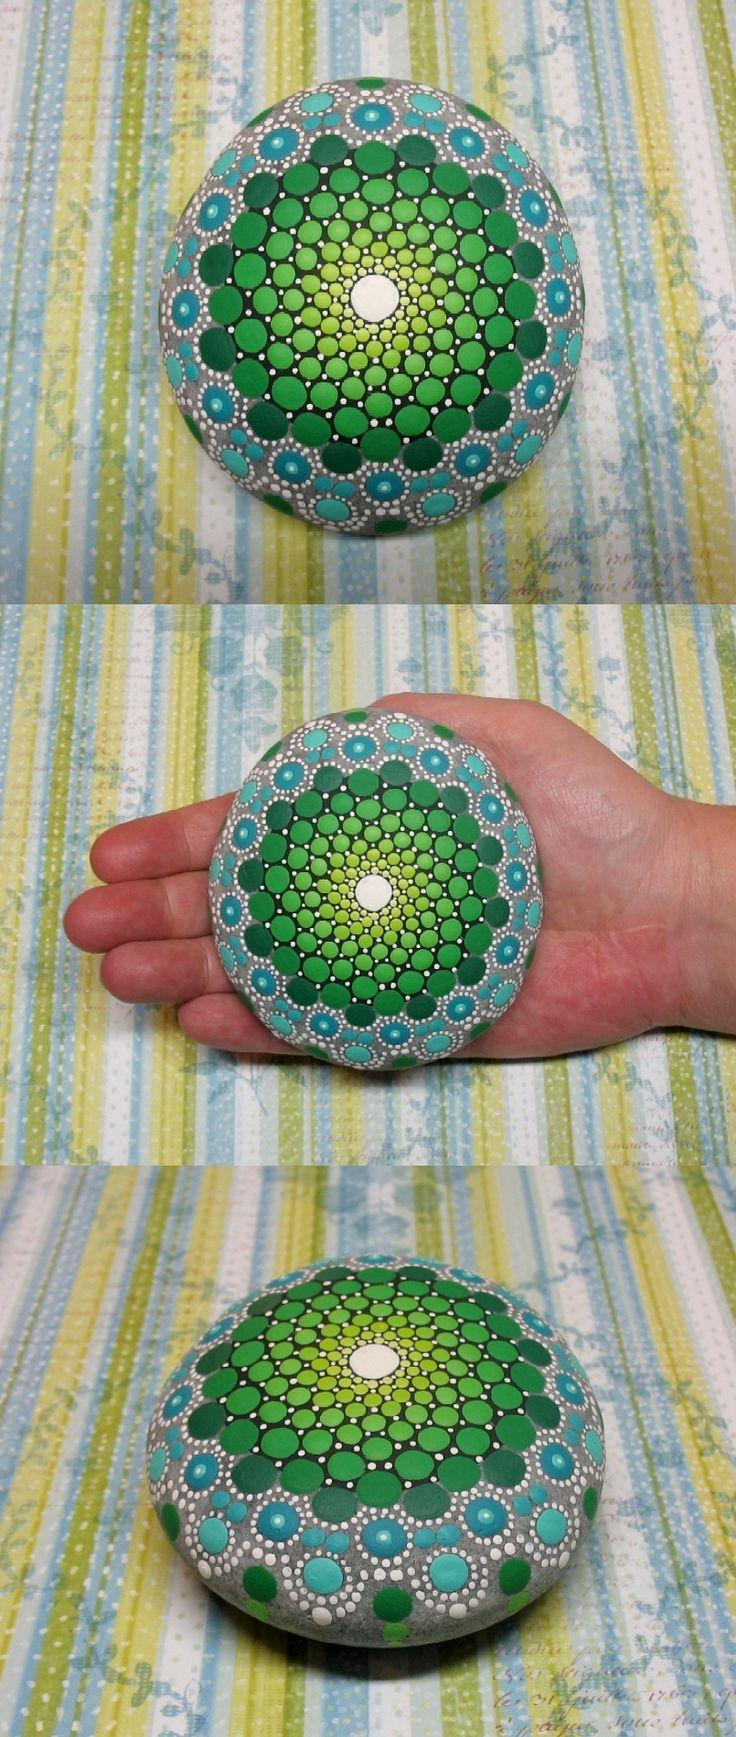 piedra Mandala verde Quiyara Artwi